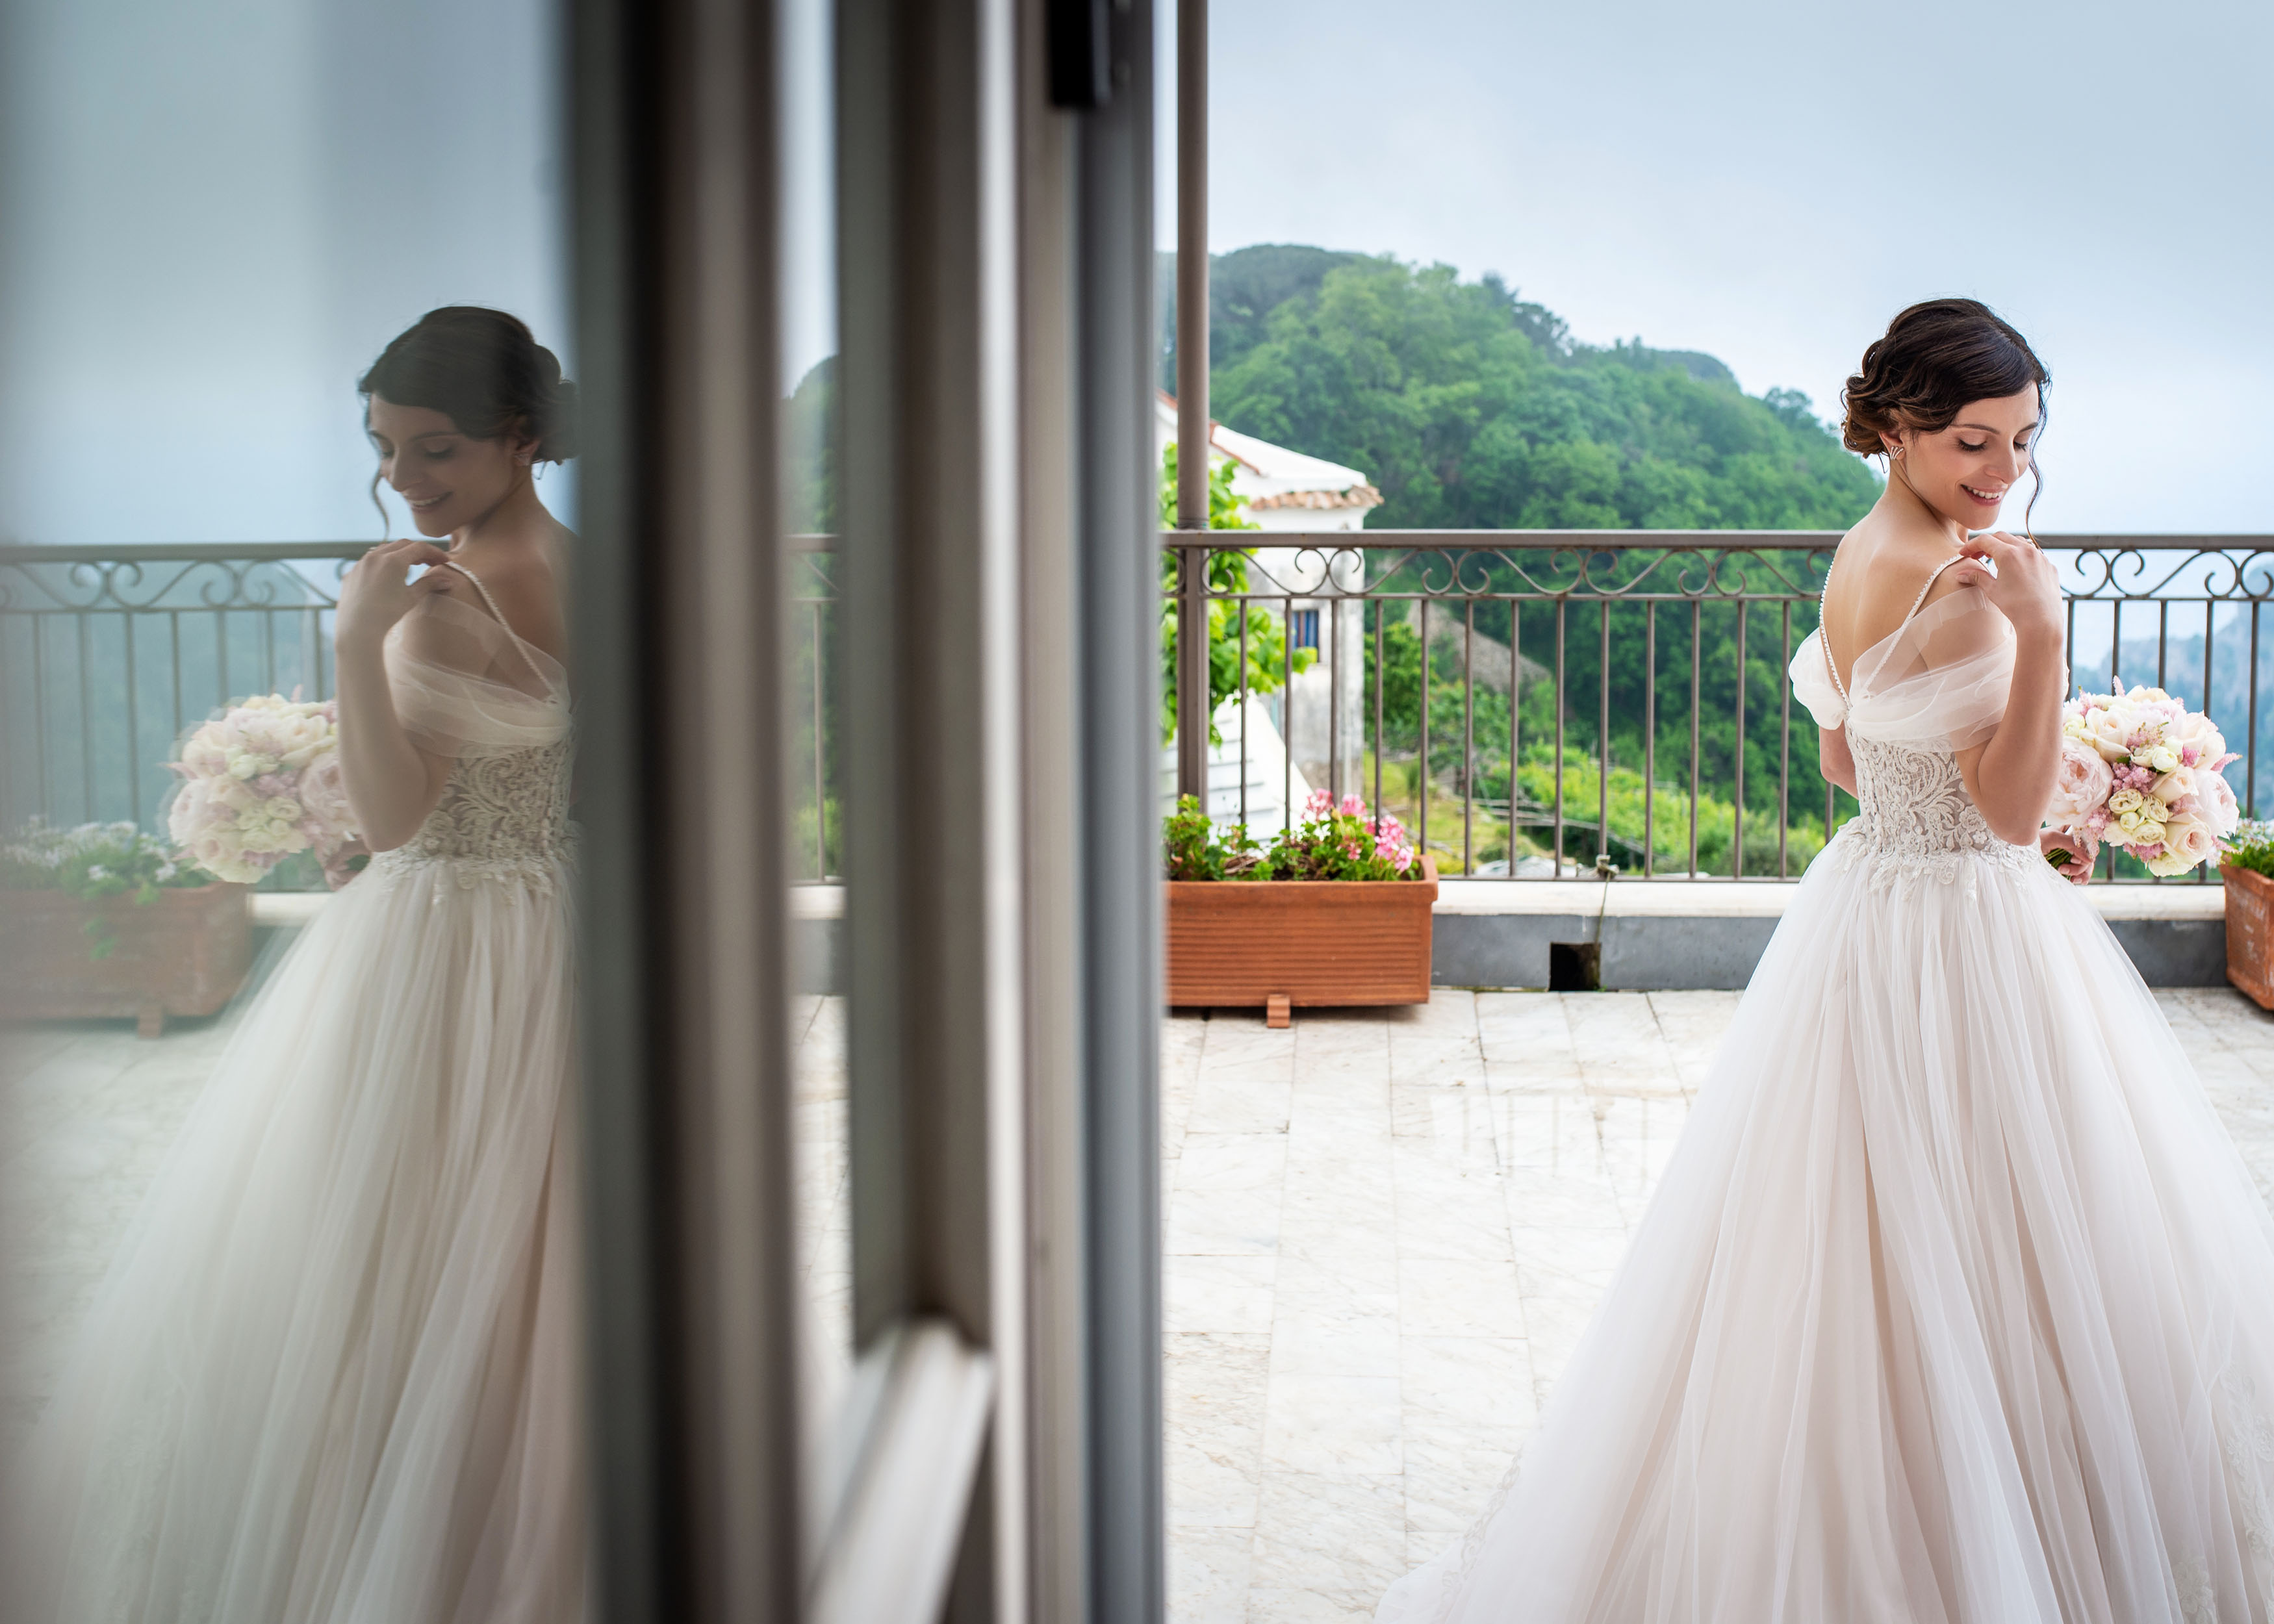 http://www.weddingamalfi.com/wp-content/uploads/Katia-Jorge-18-maggio-2019-18.jpg